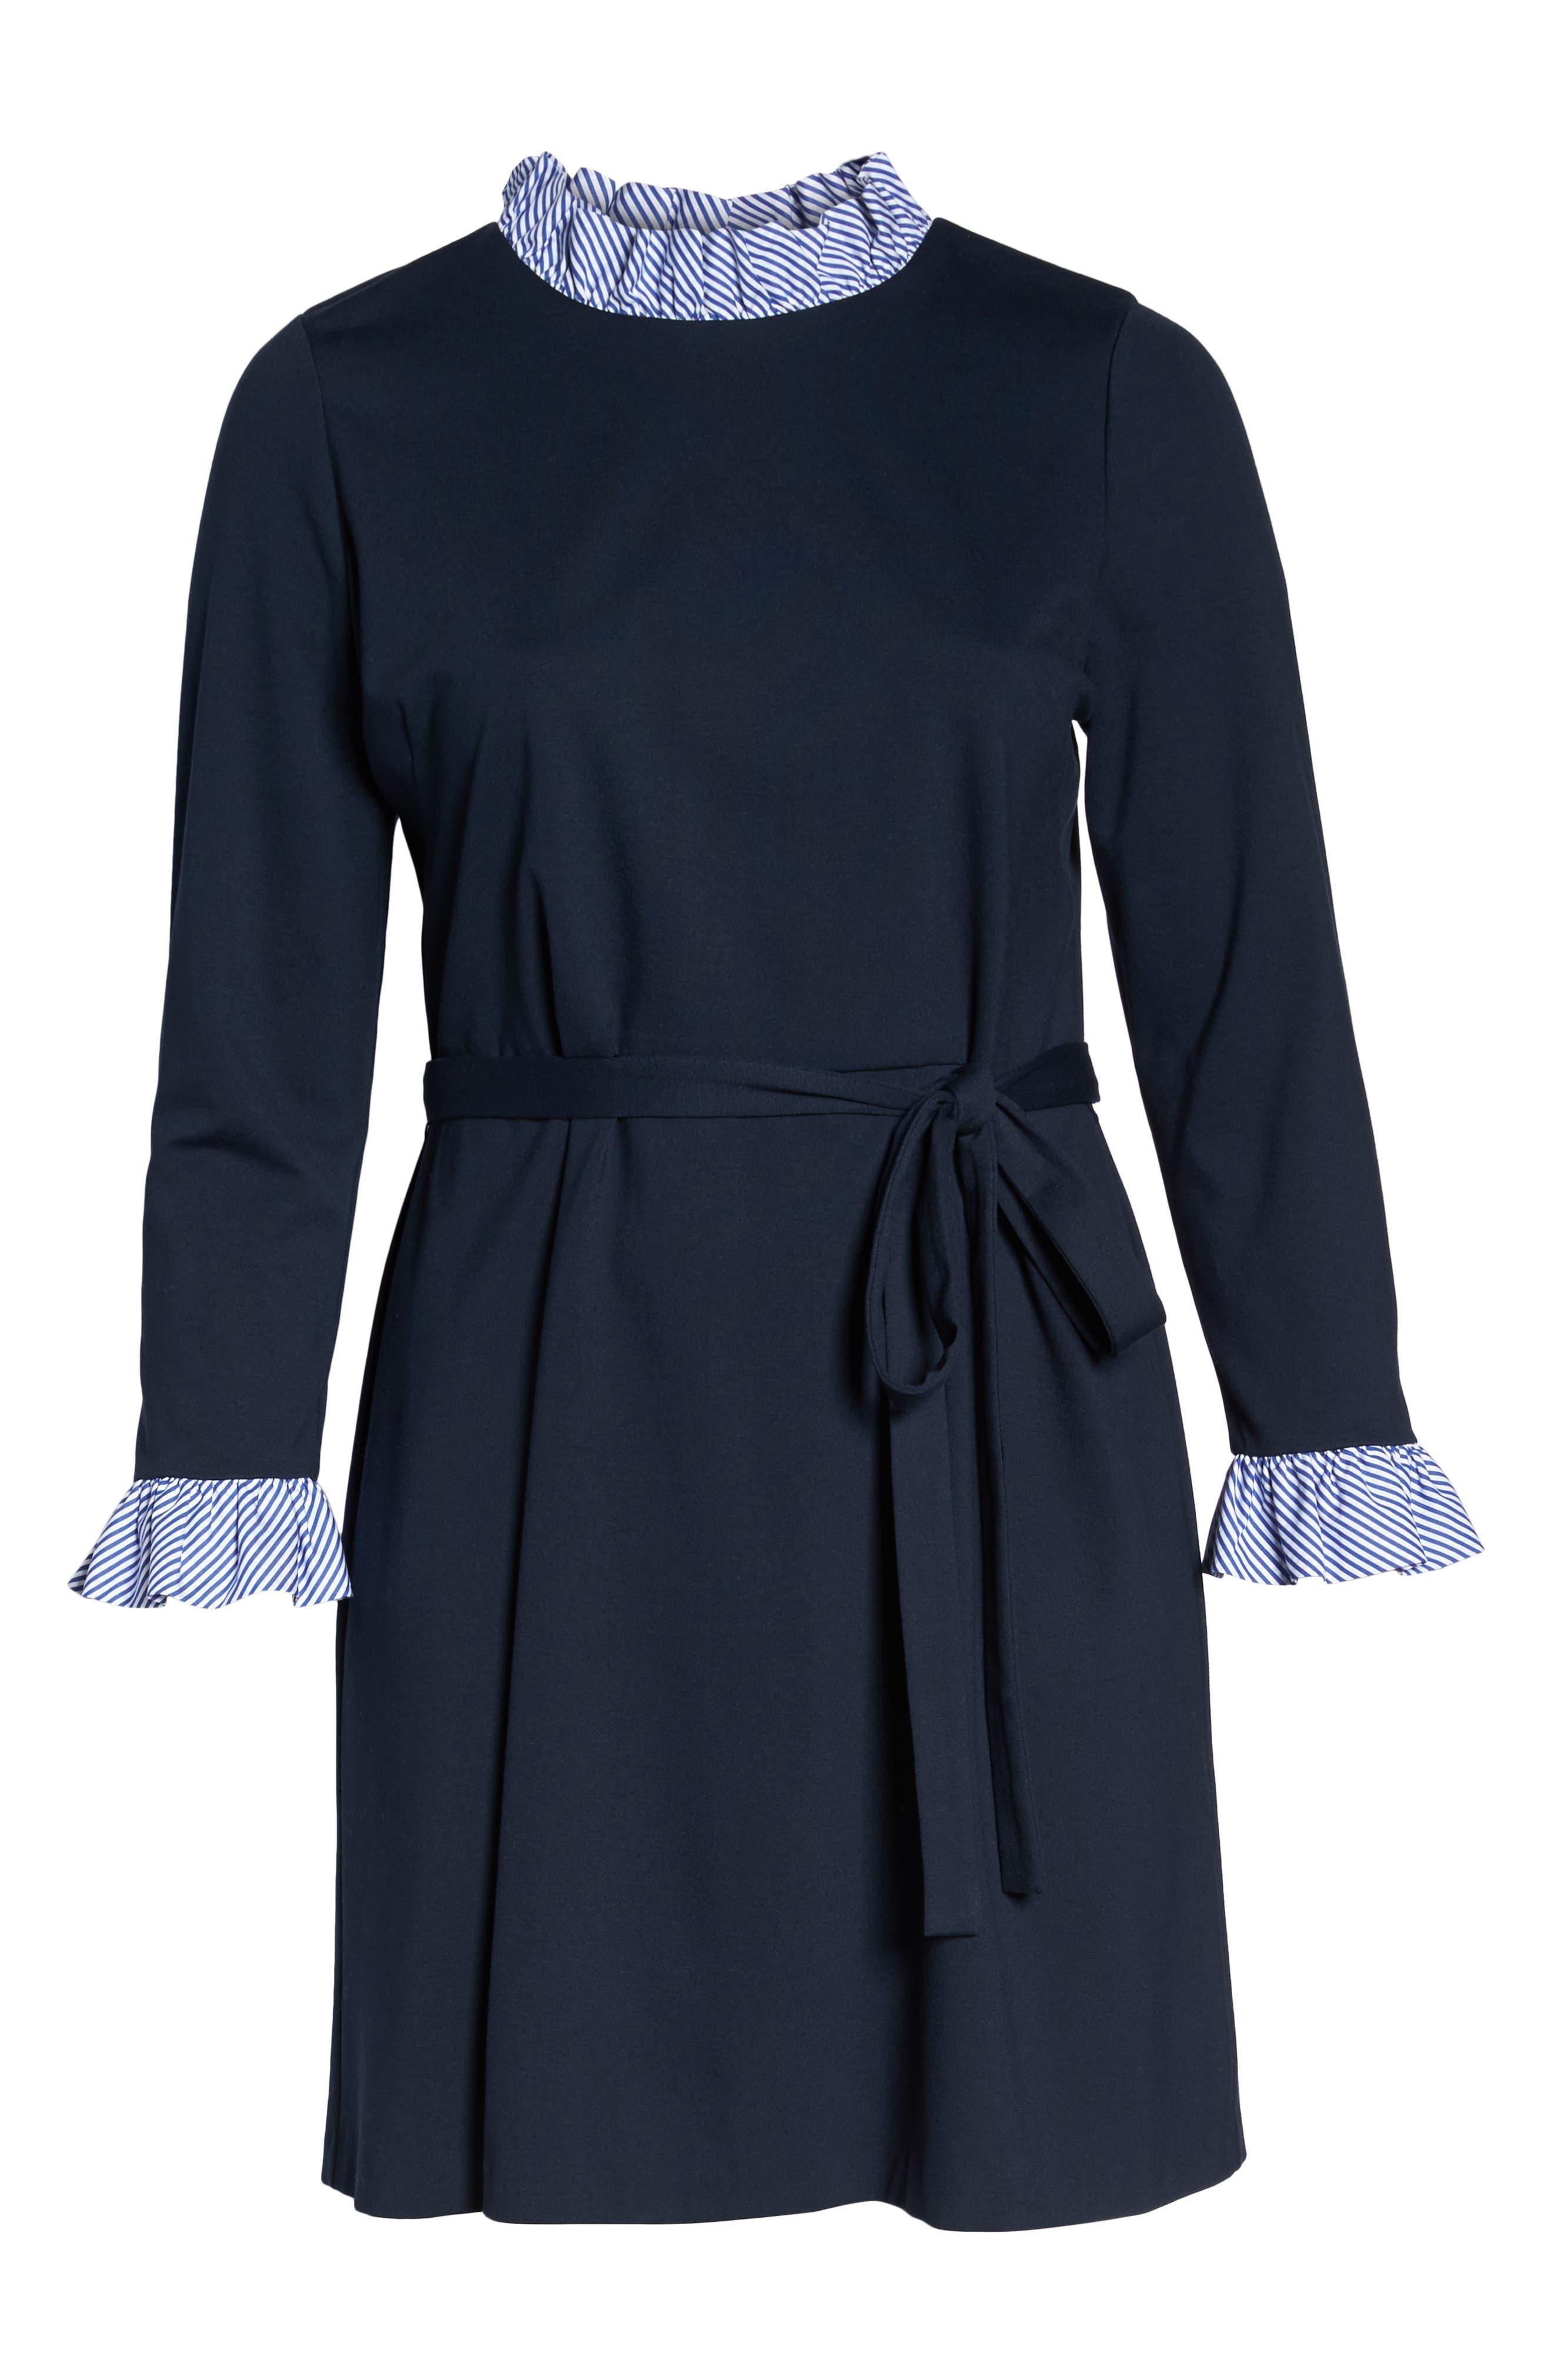 Long Sleeve Ruffle Detail Shirtdress,                             Alternate thumbnail 12, color,                             NAVY